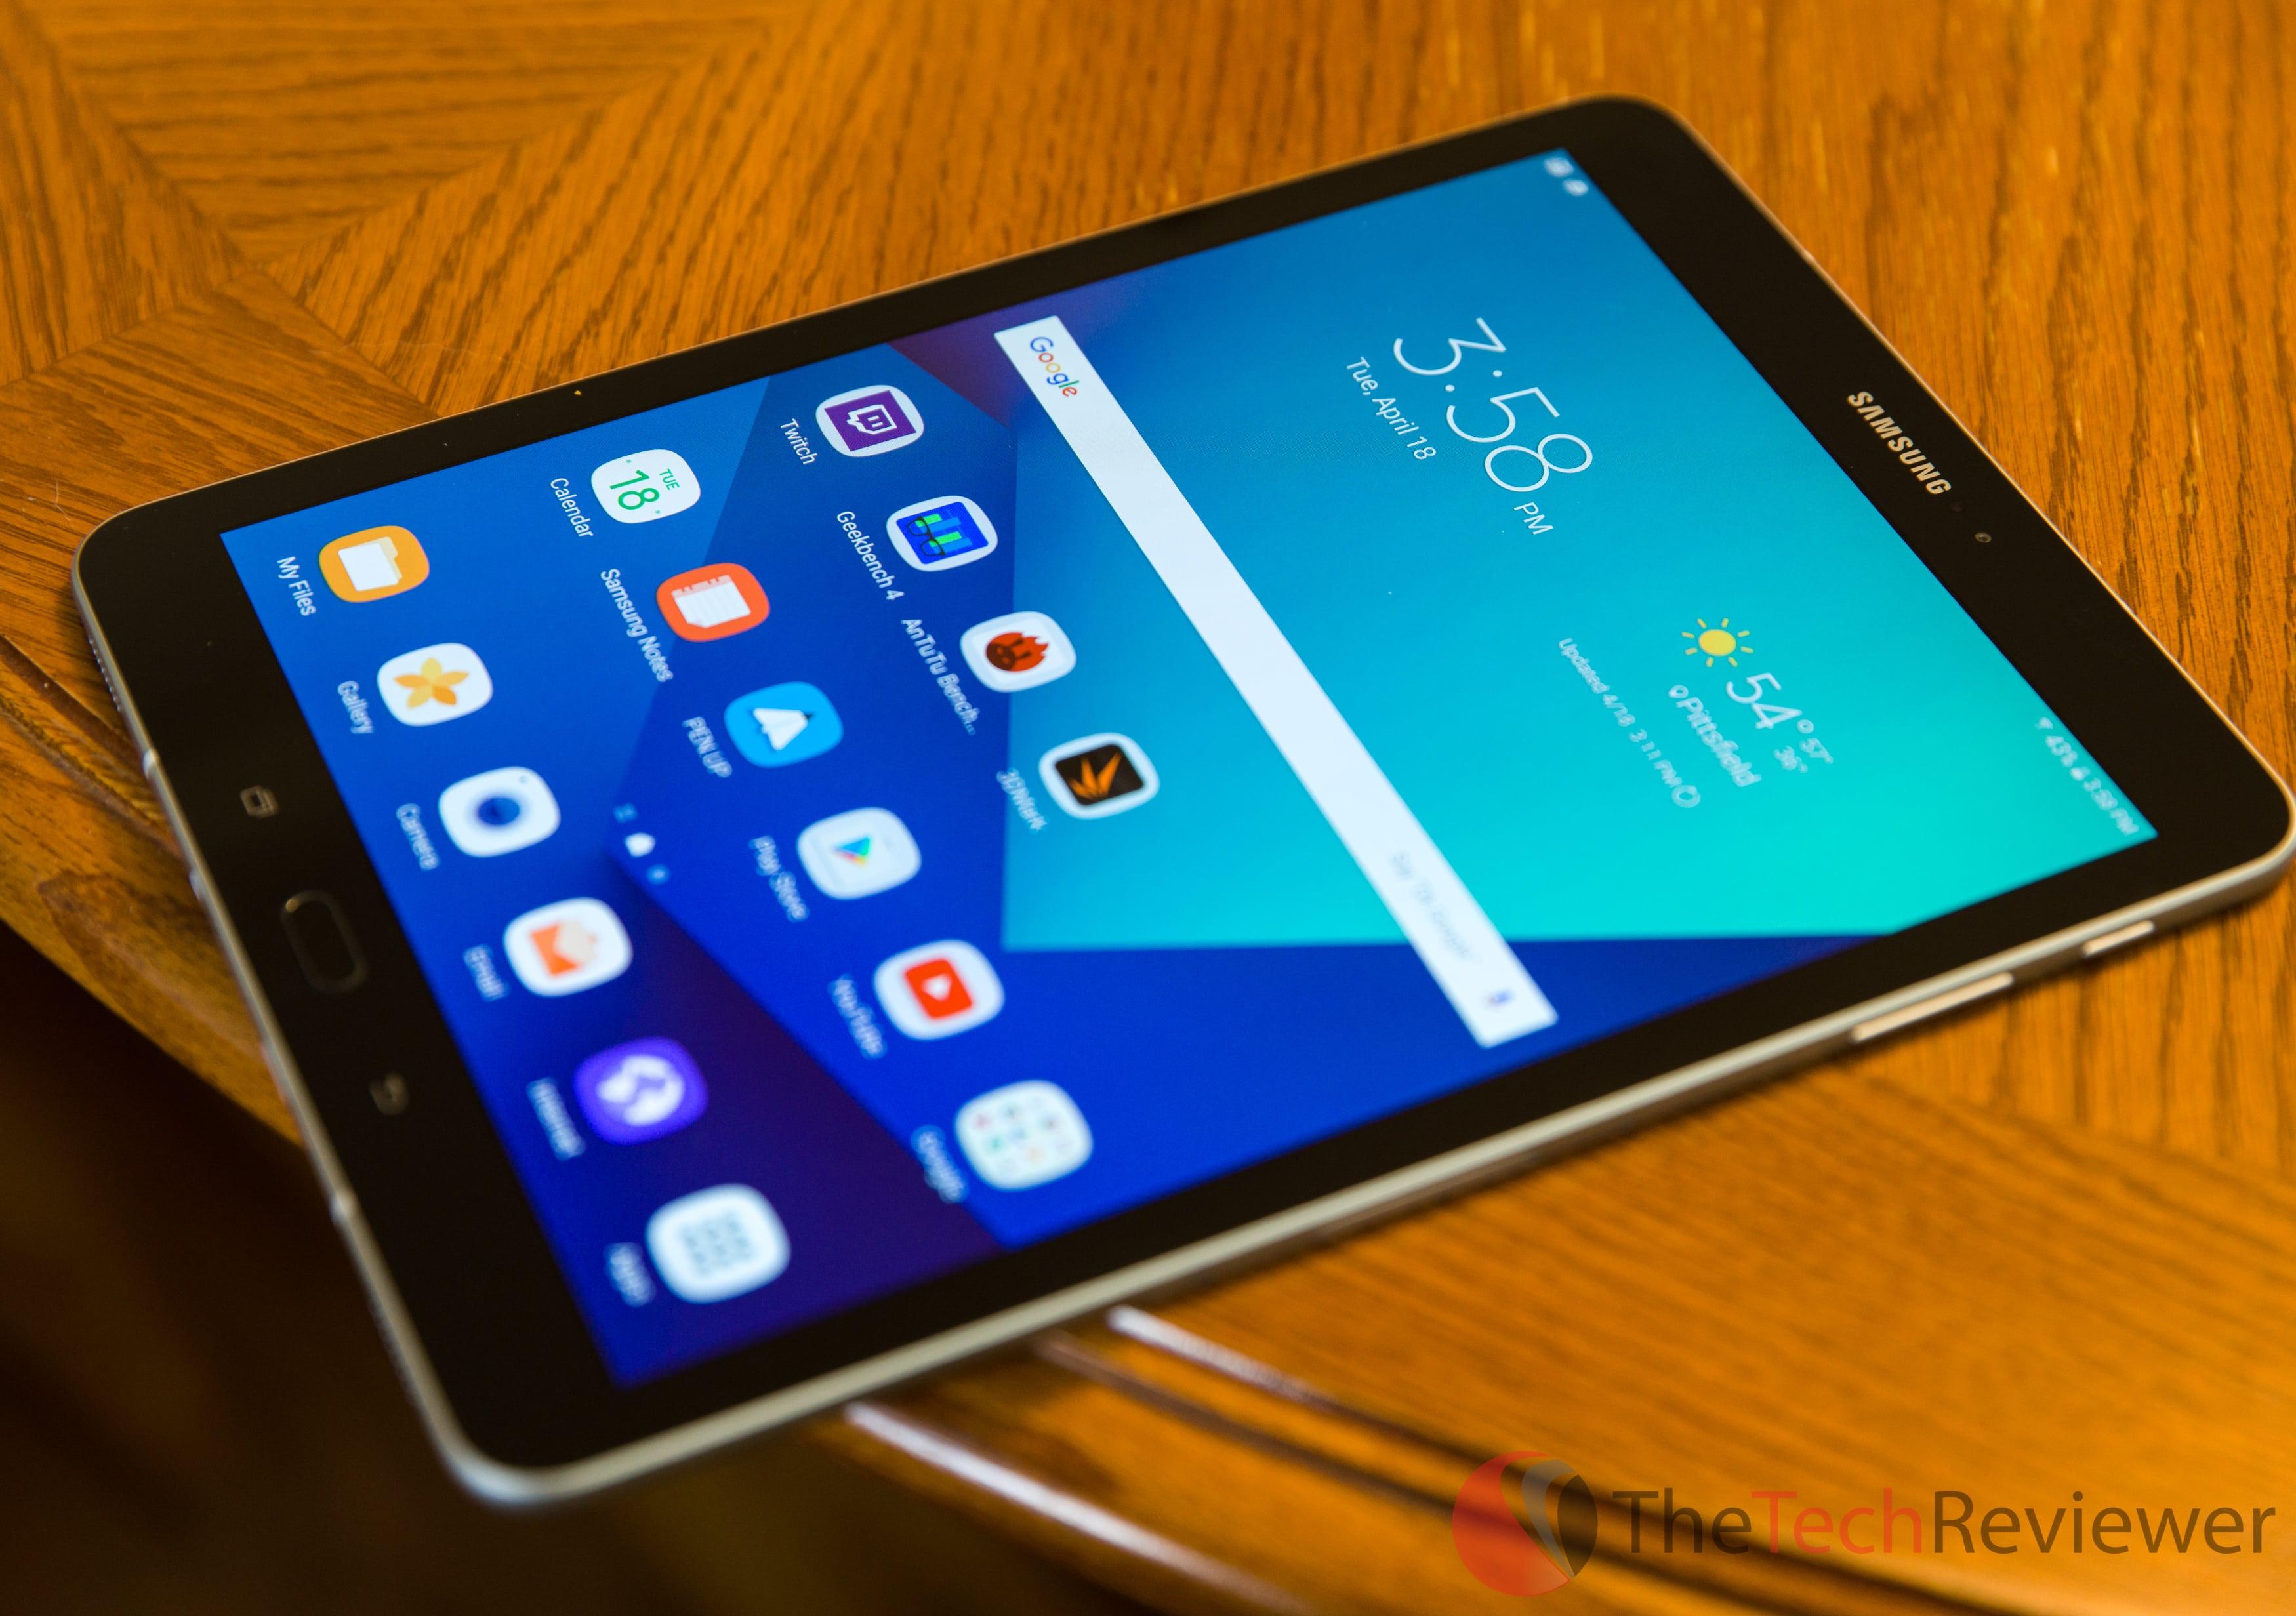 Samsung Galaxy Tab S3 4 of 10